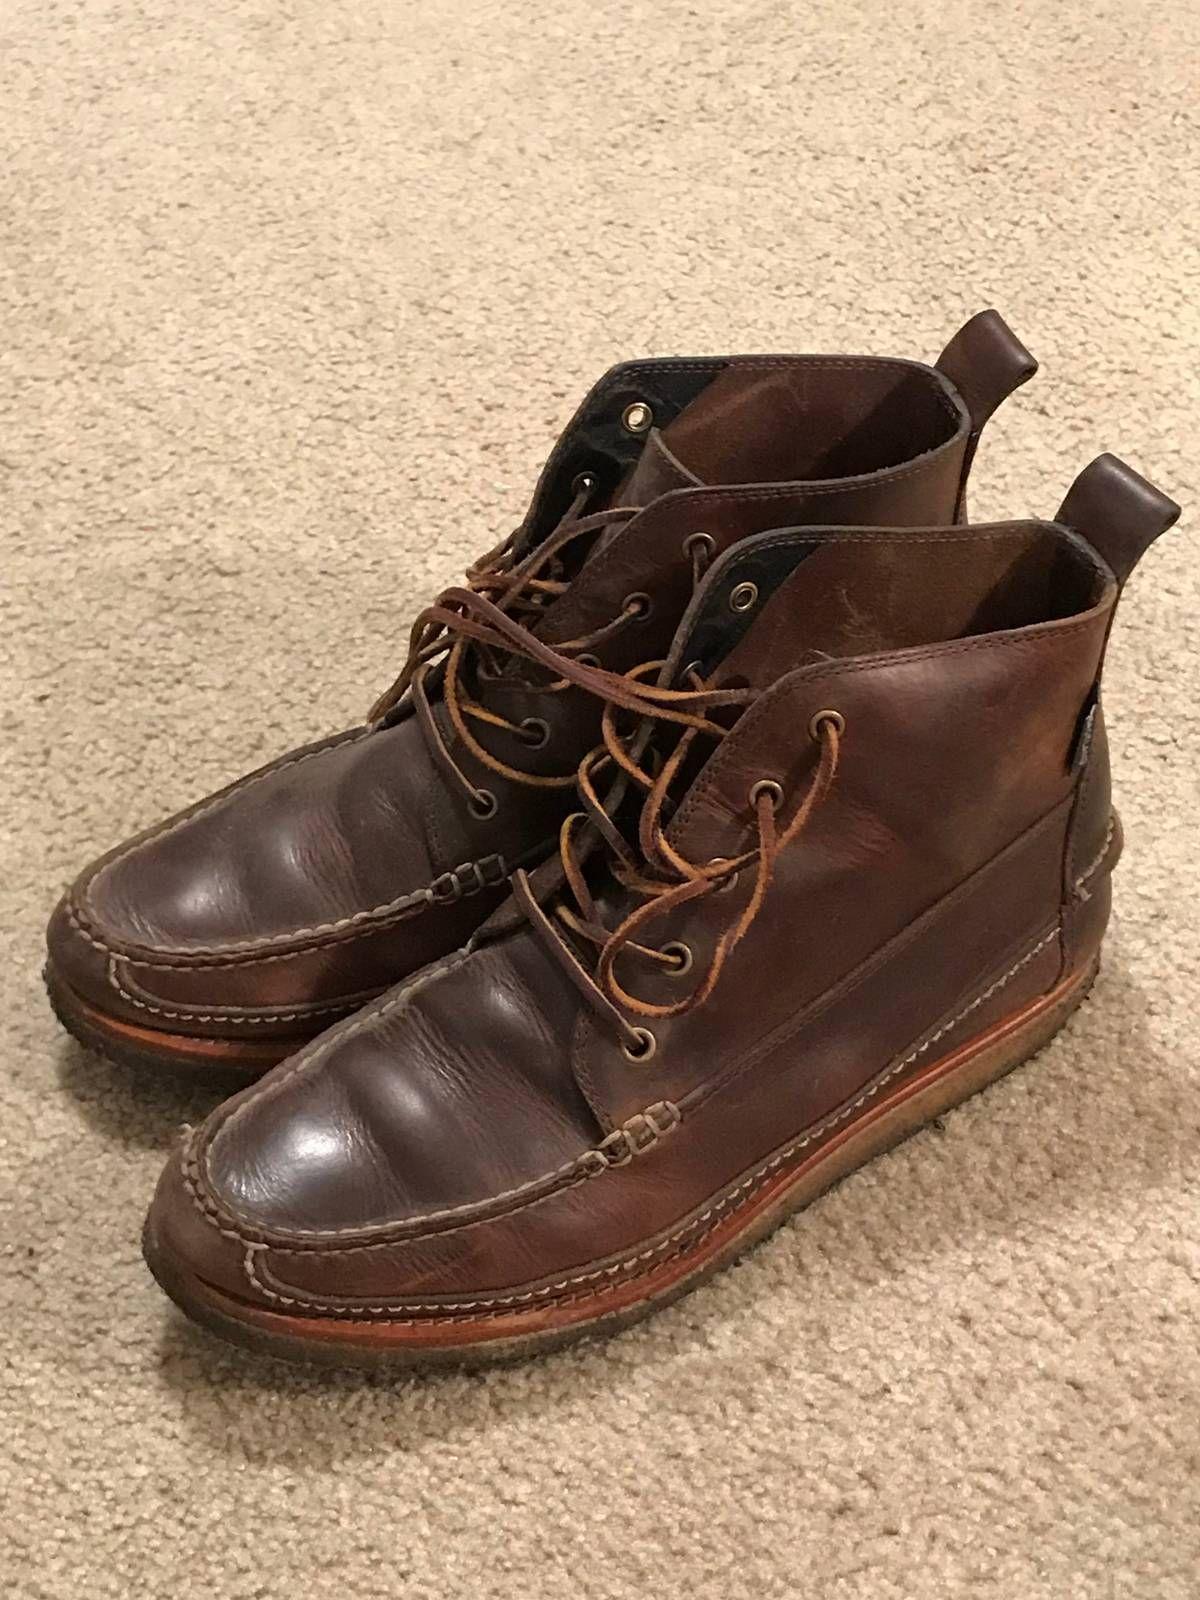 063096c0691 Buy Eastland Eastland Mens Stonington 1995 Chukka Boot